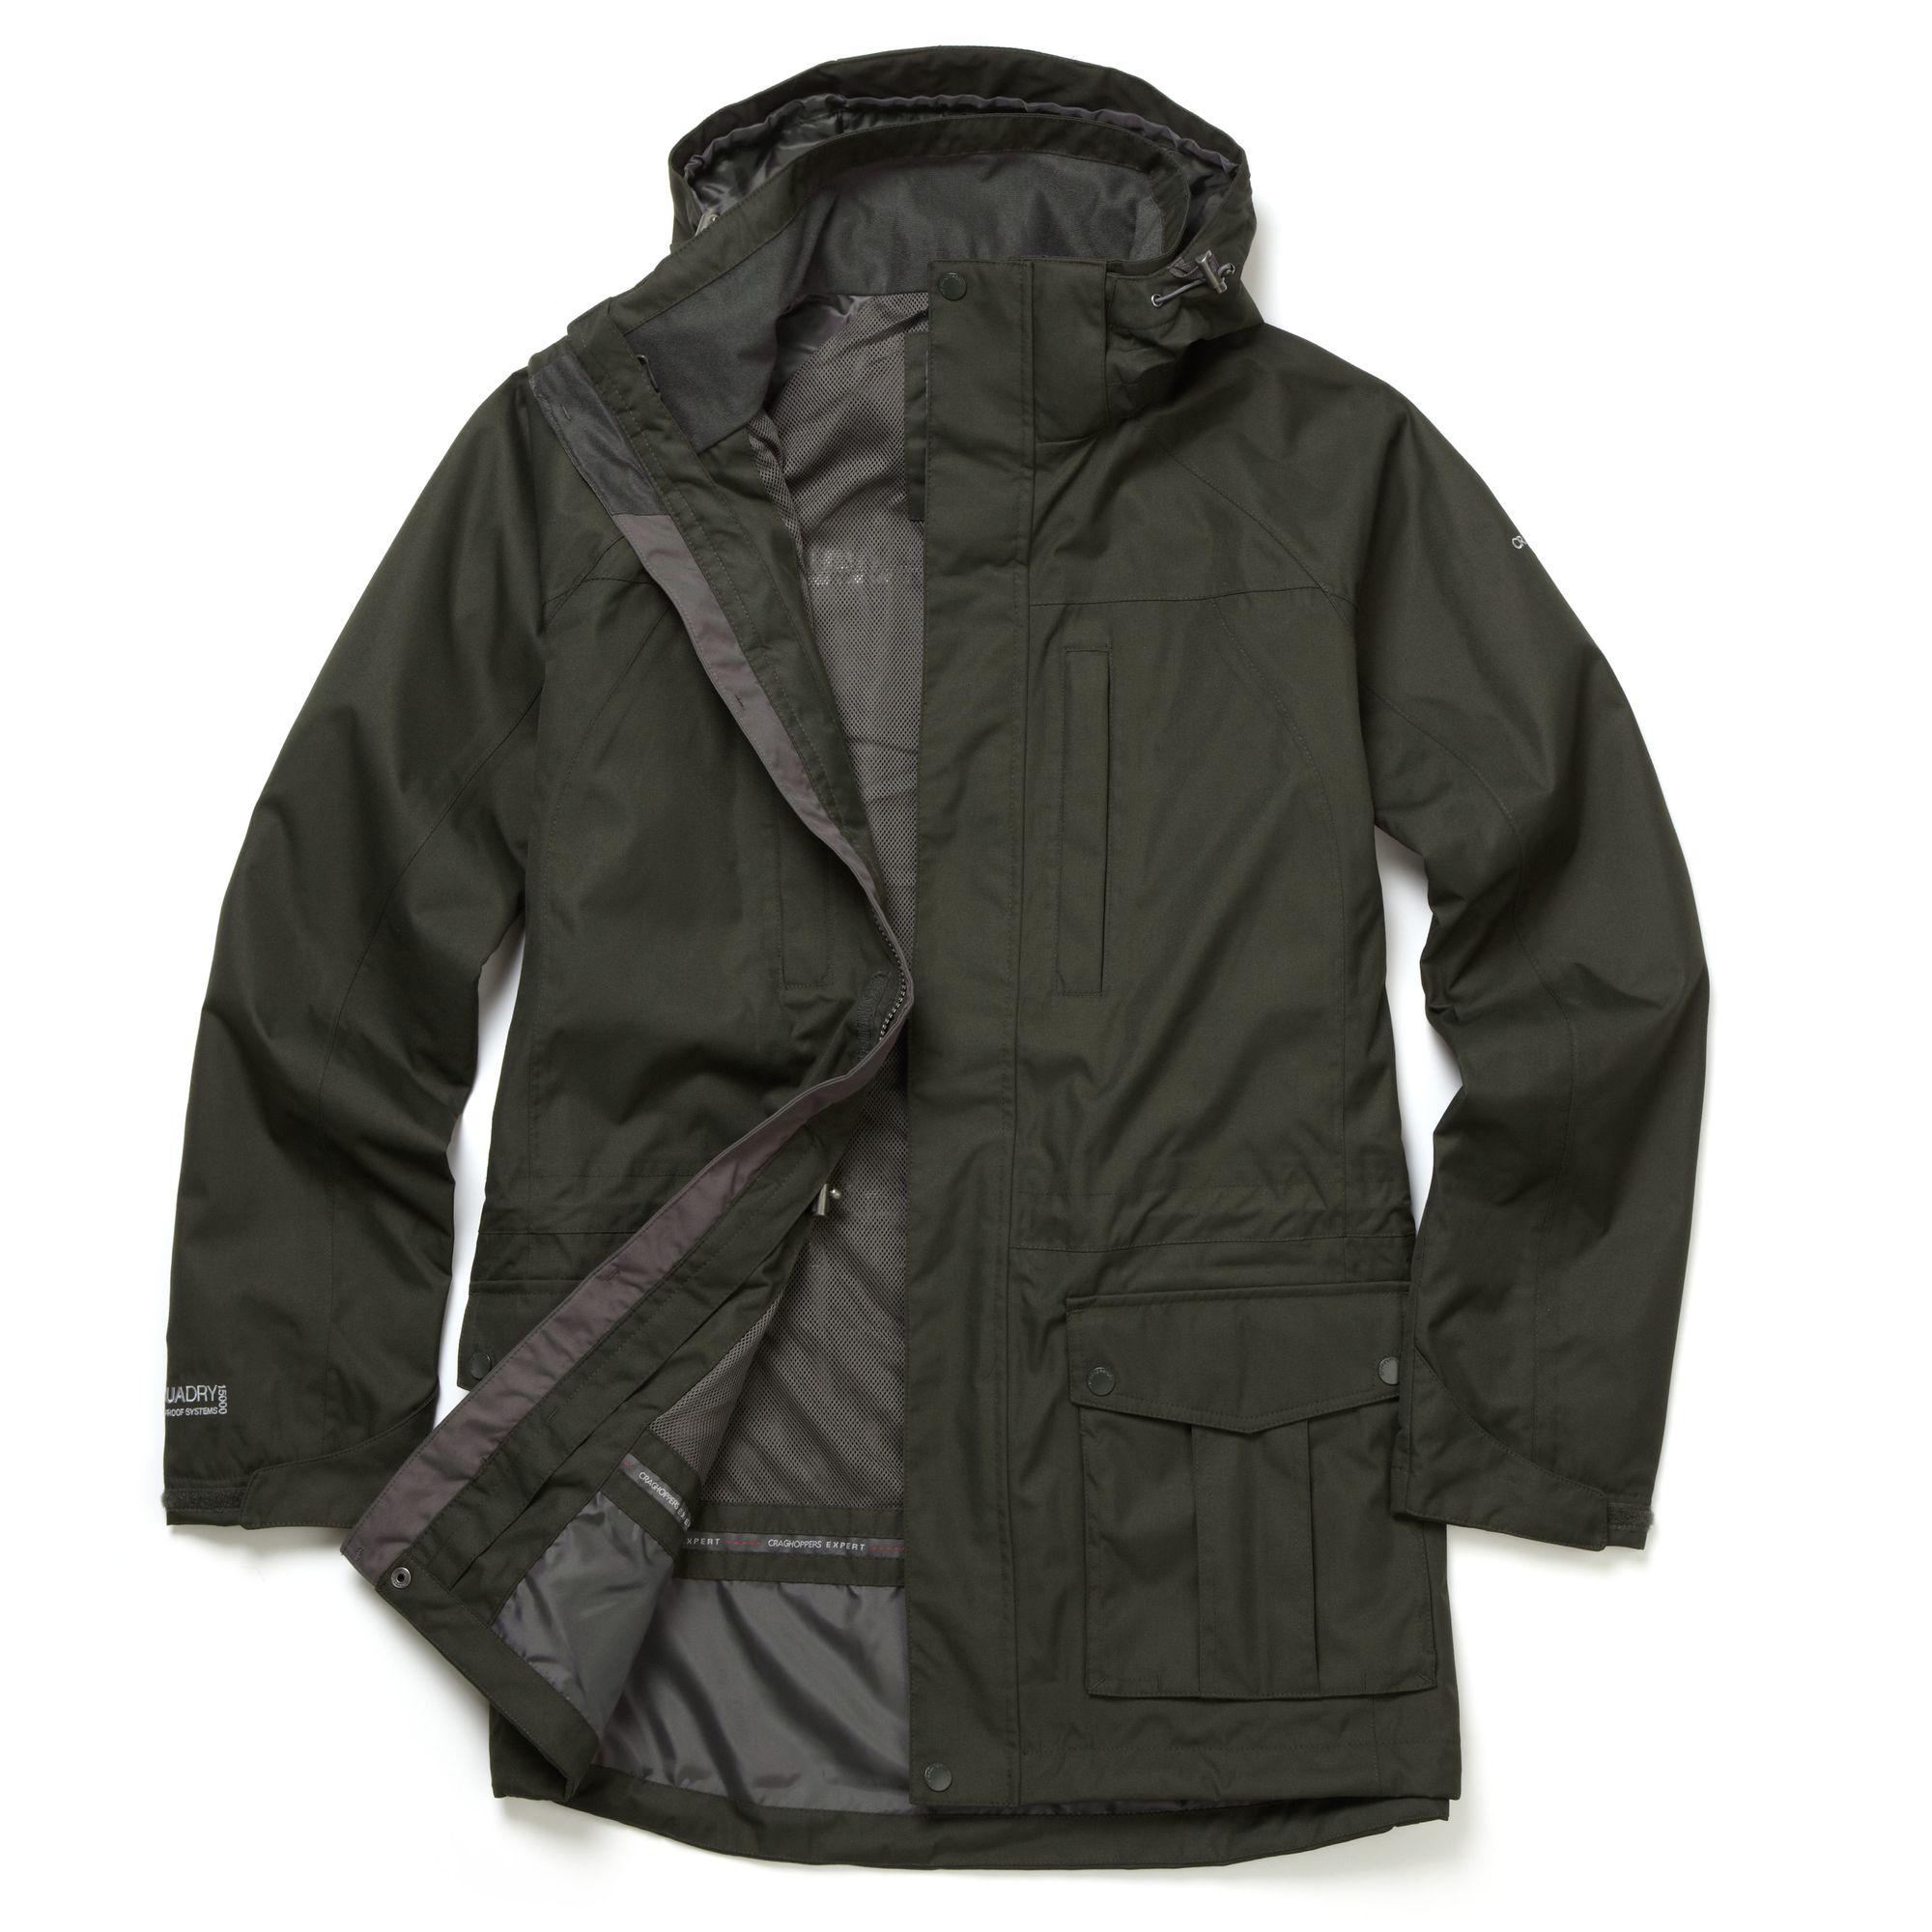 Craghoppers Allwetterjacke Mens Expert Kiwi Long Jacke   Bekleidung > Jacken > Sonstige Jacken   Craghoppers